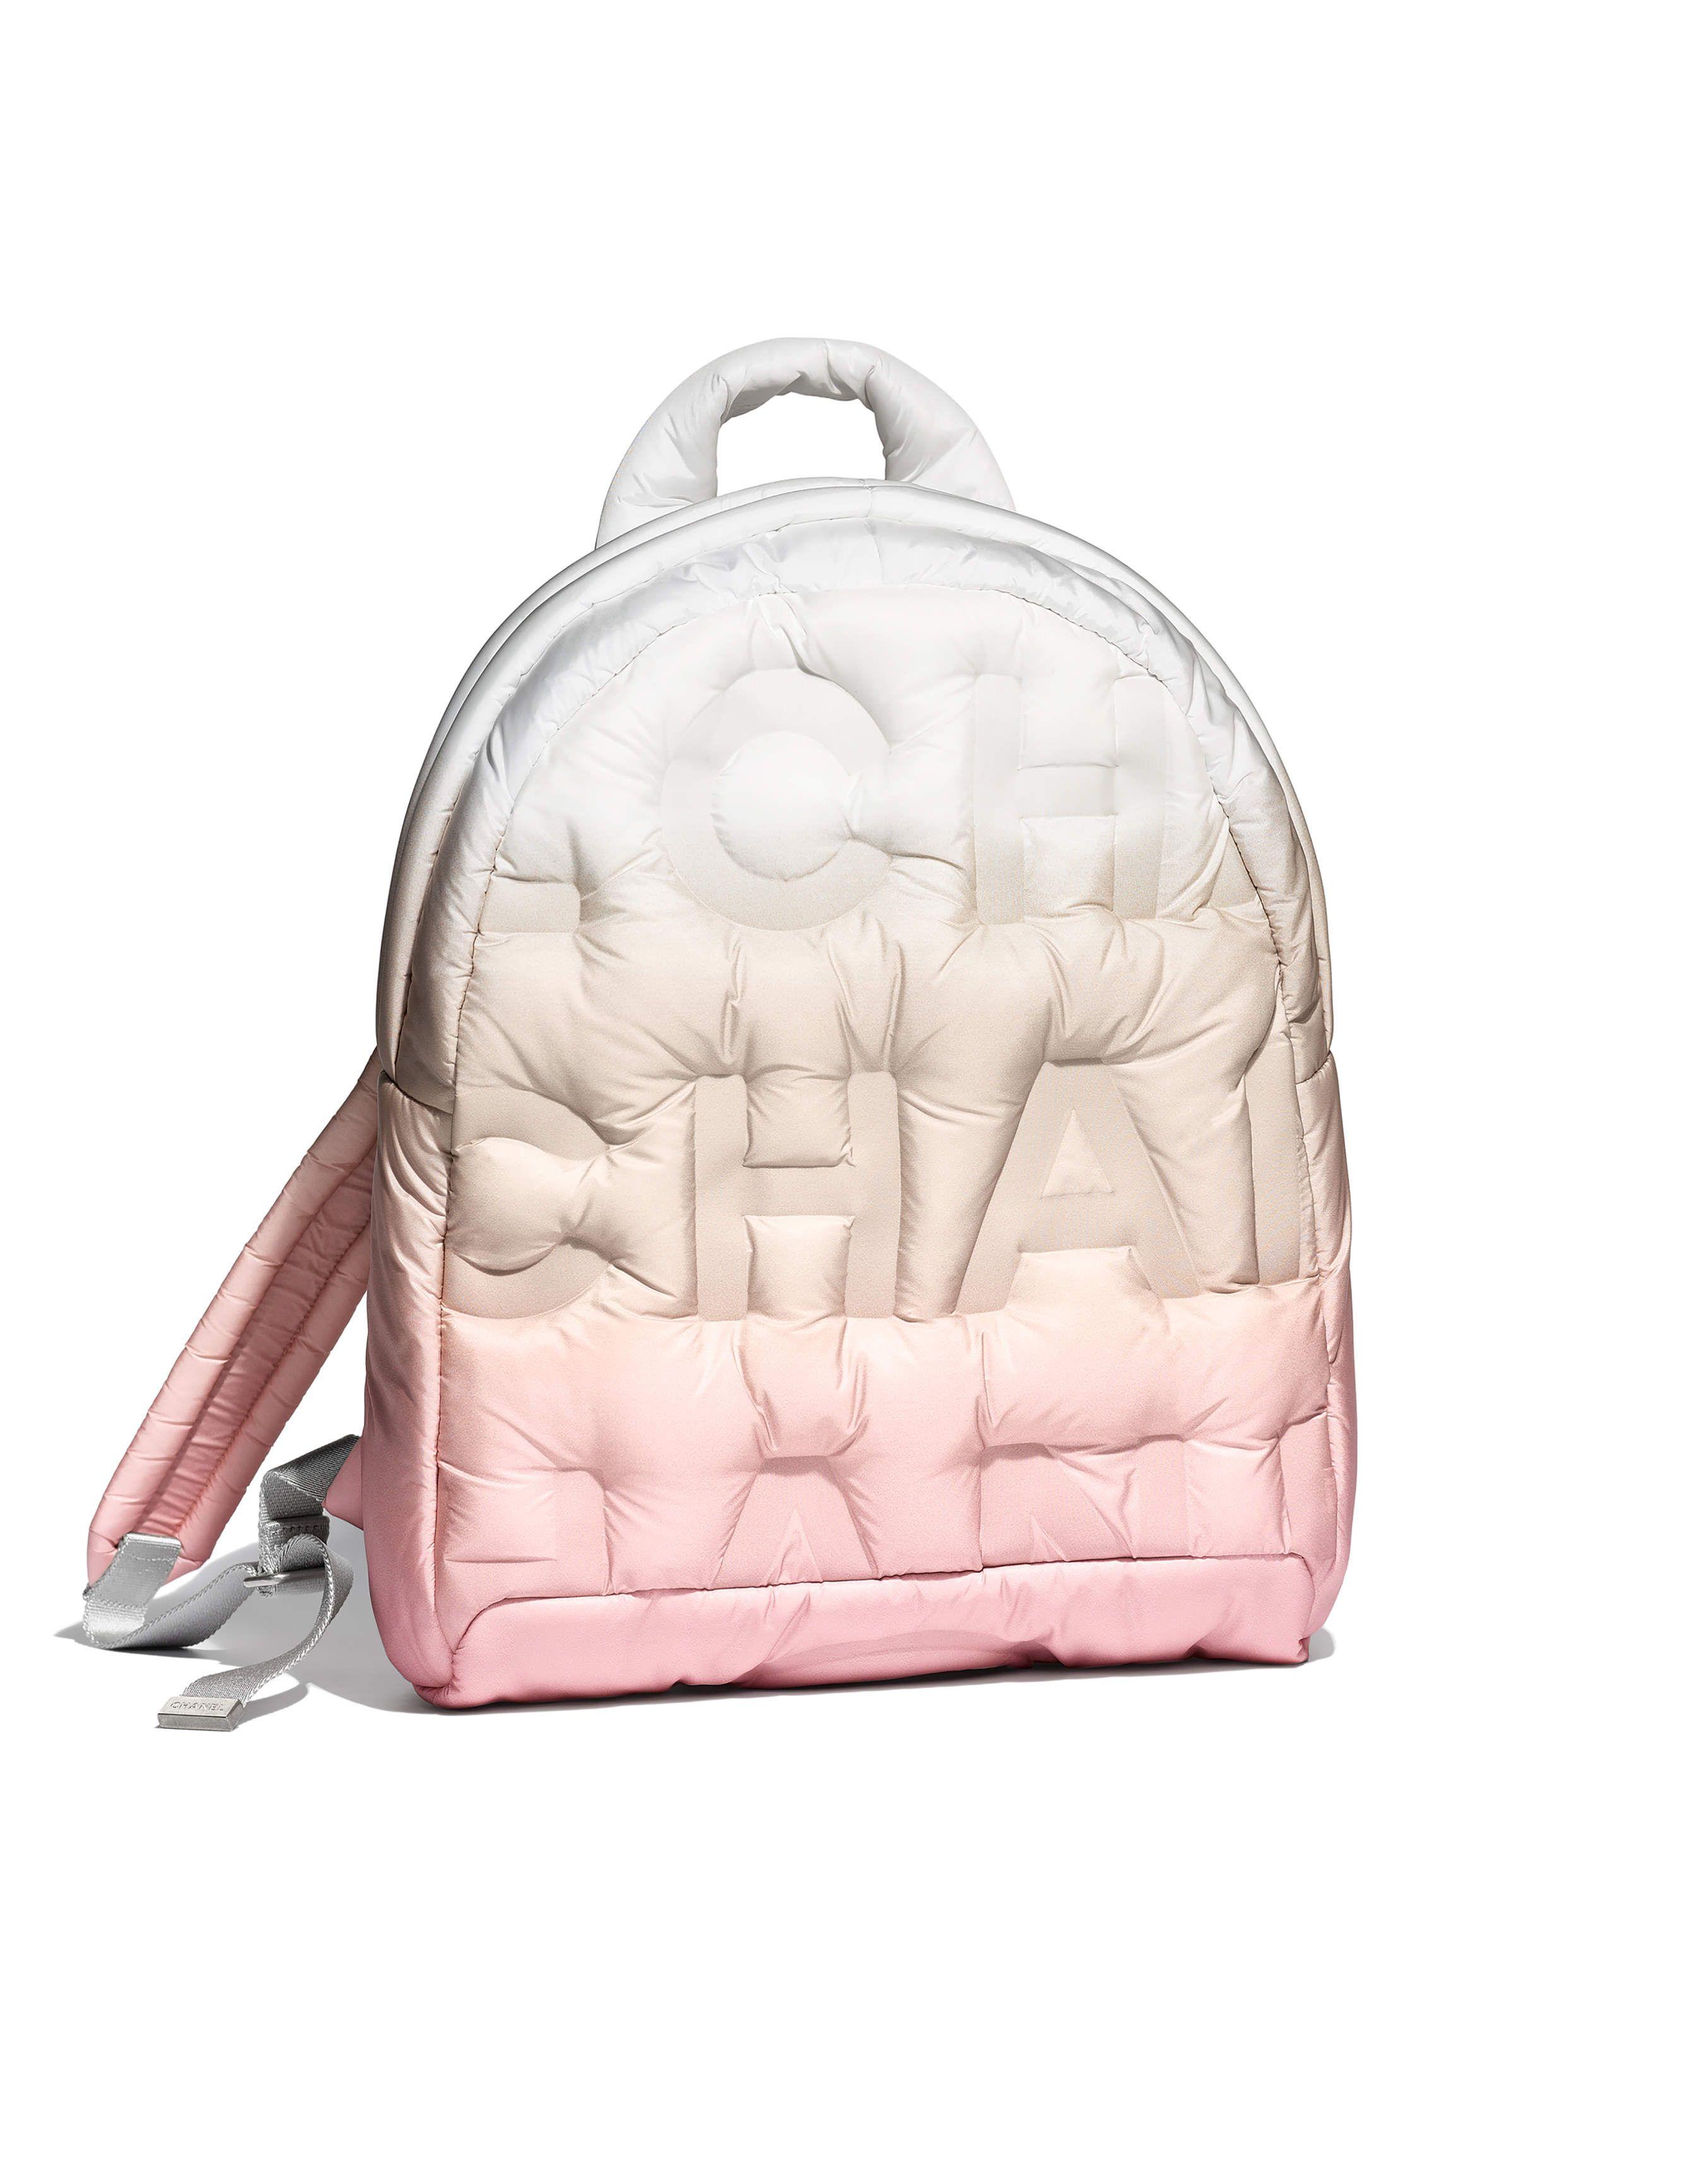 bebcae15f72710 Backpack, embossed nylon & silver-tone metal-pink, beige & white - CHANEL